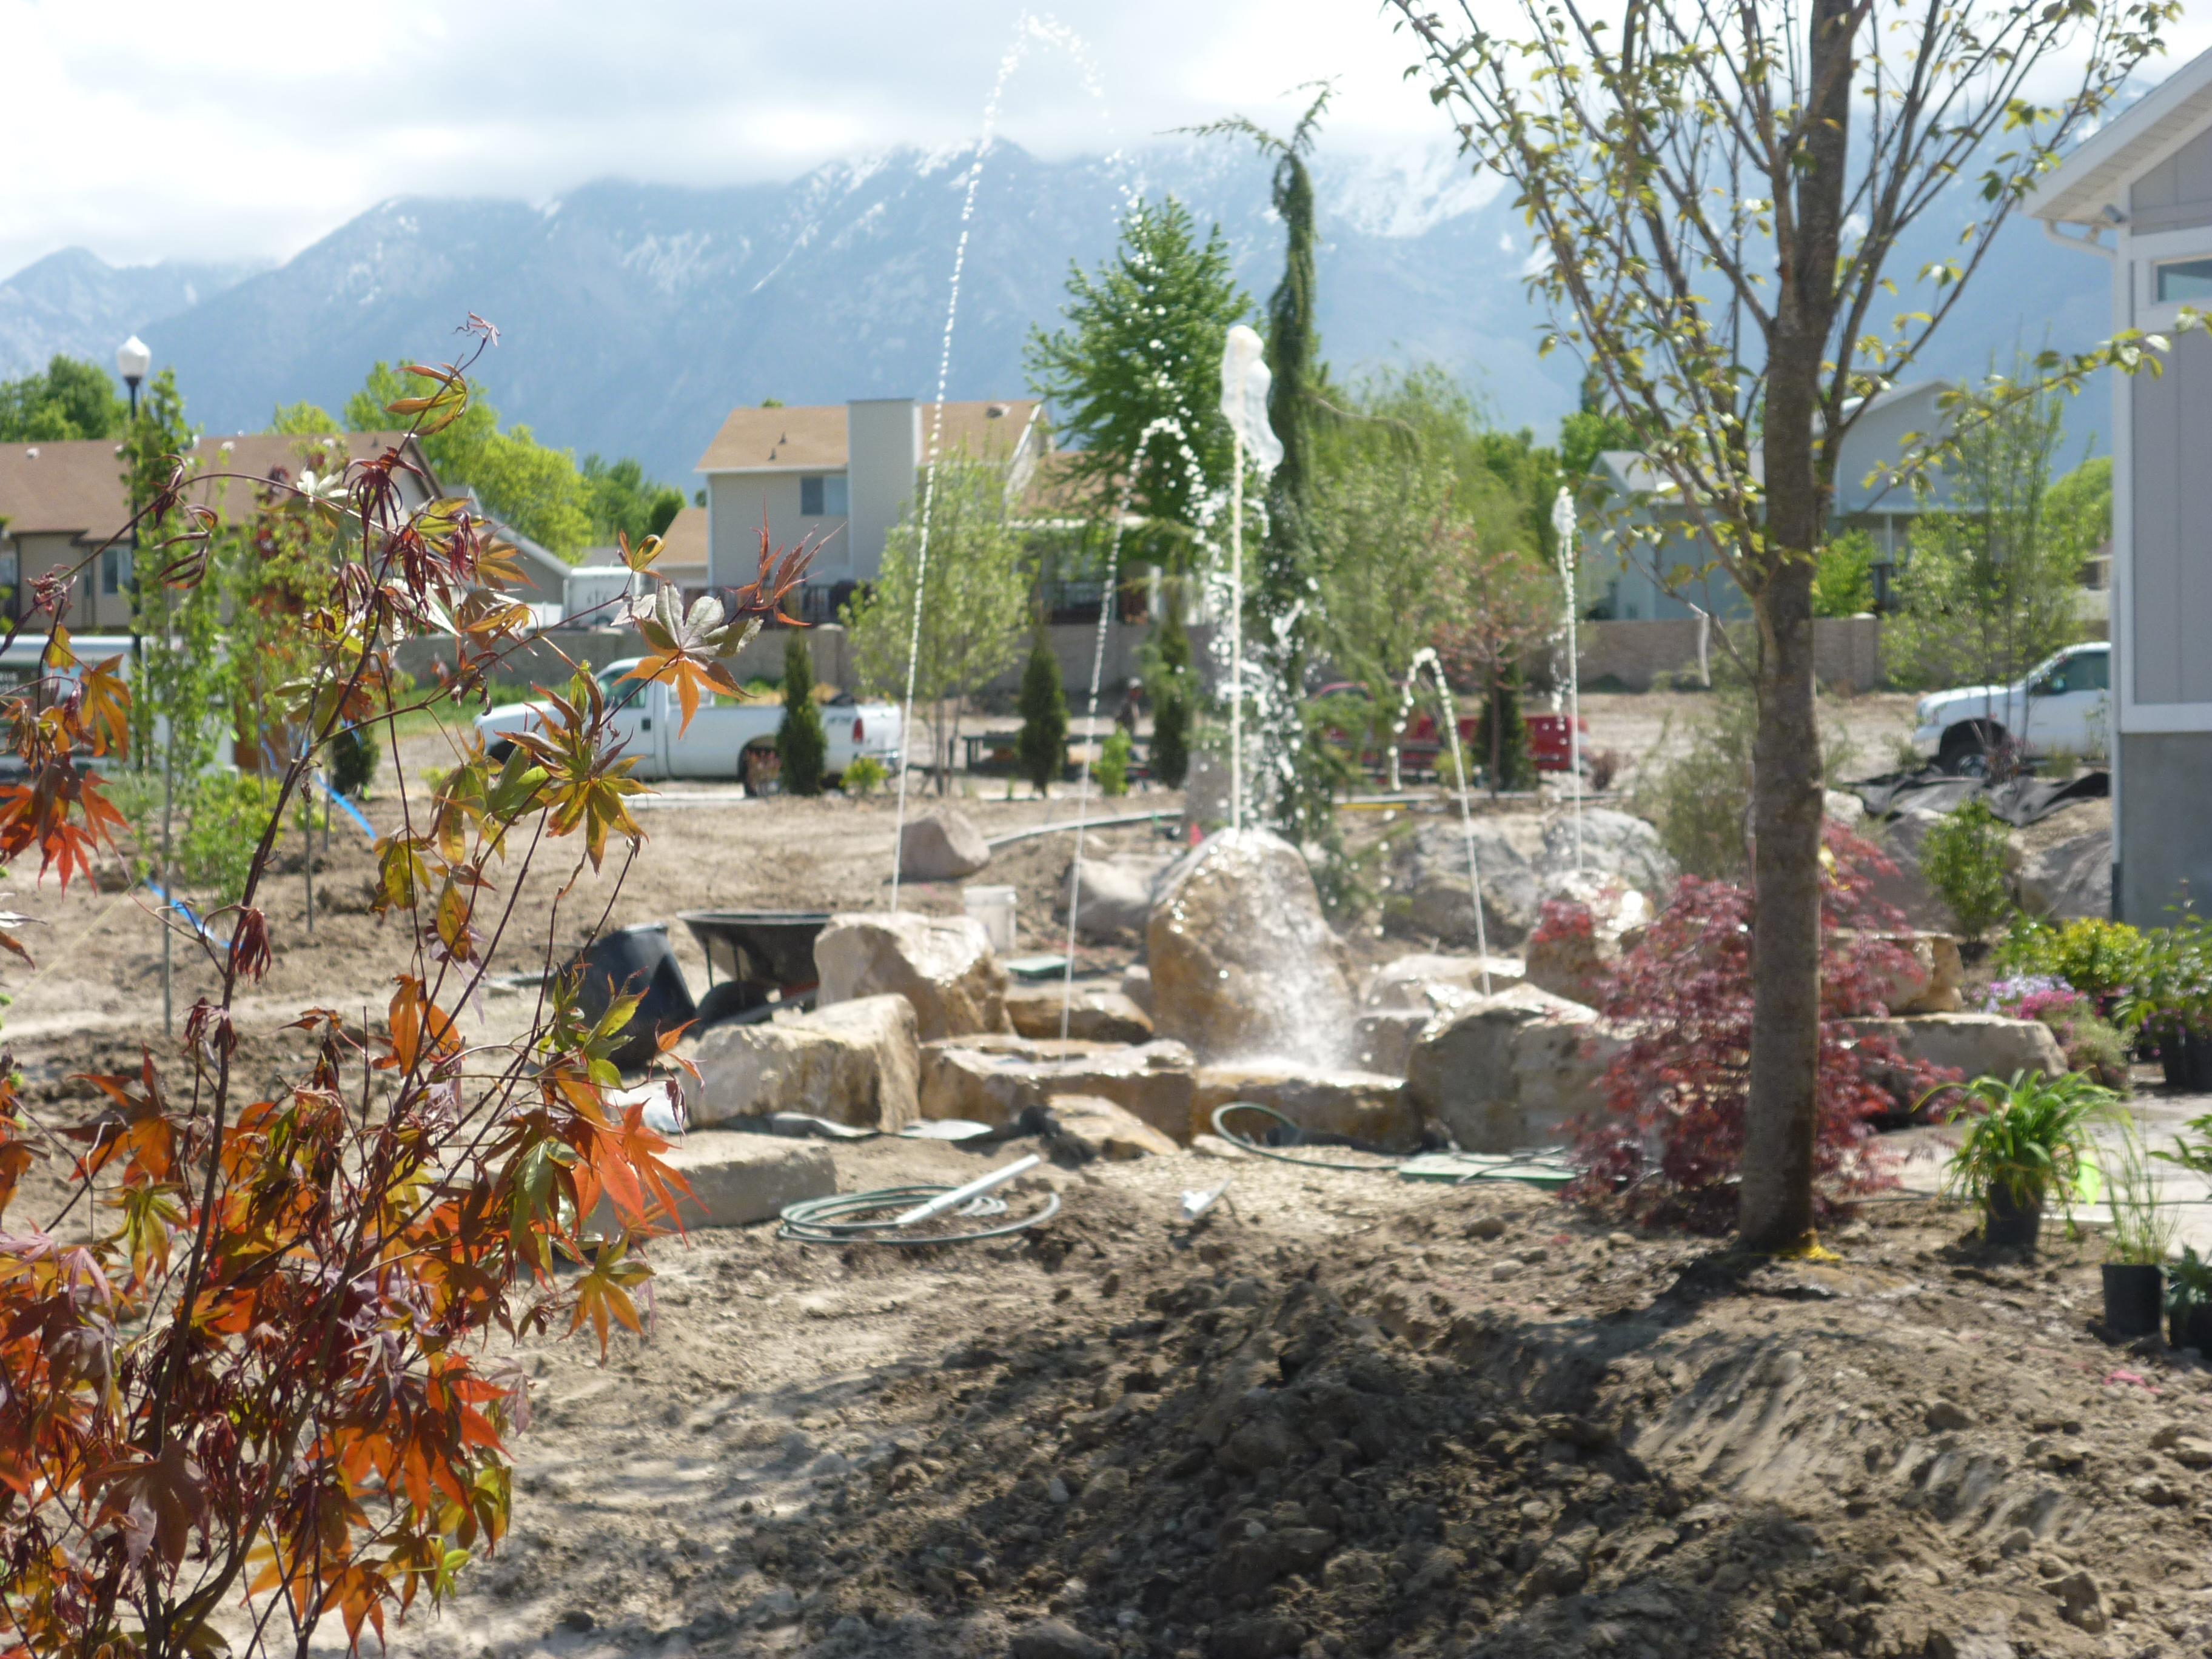 Utah landscaper landscaping the front and backyard for Pool design utah